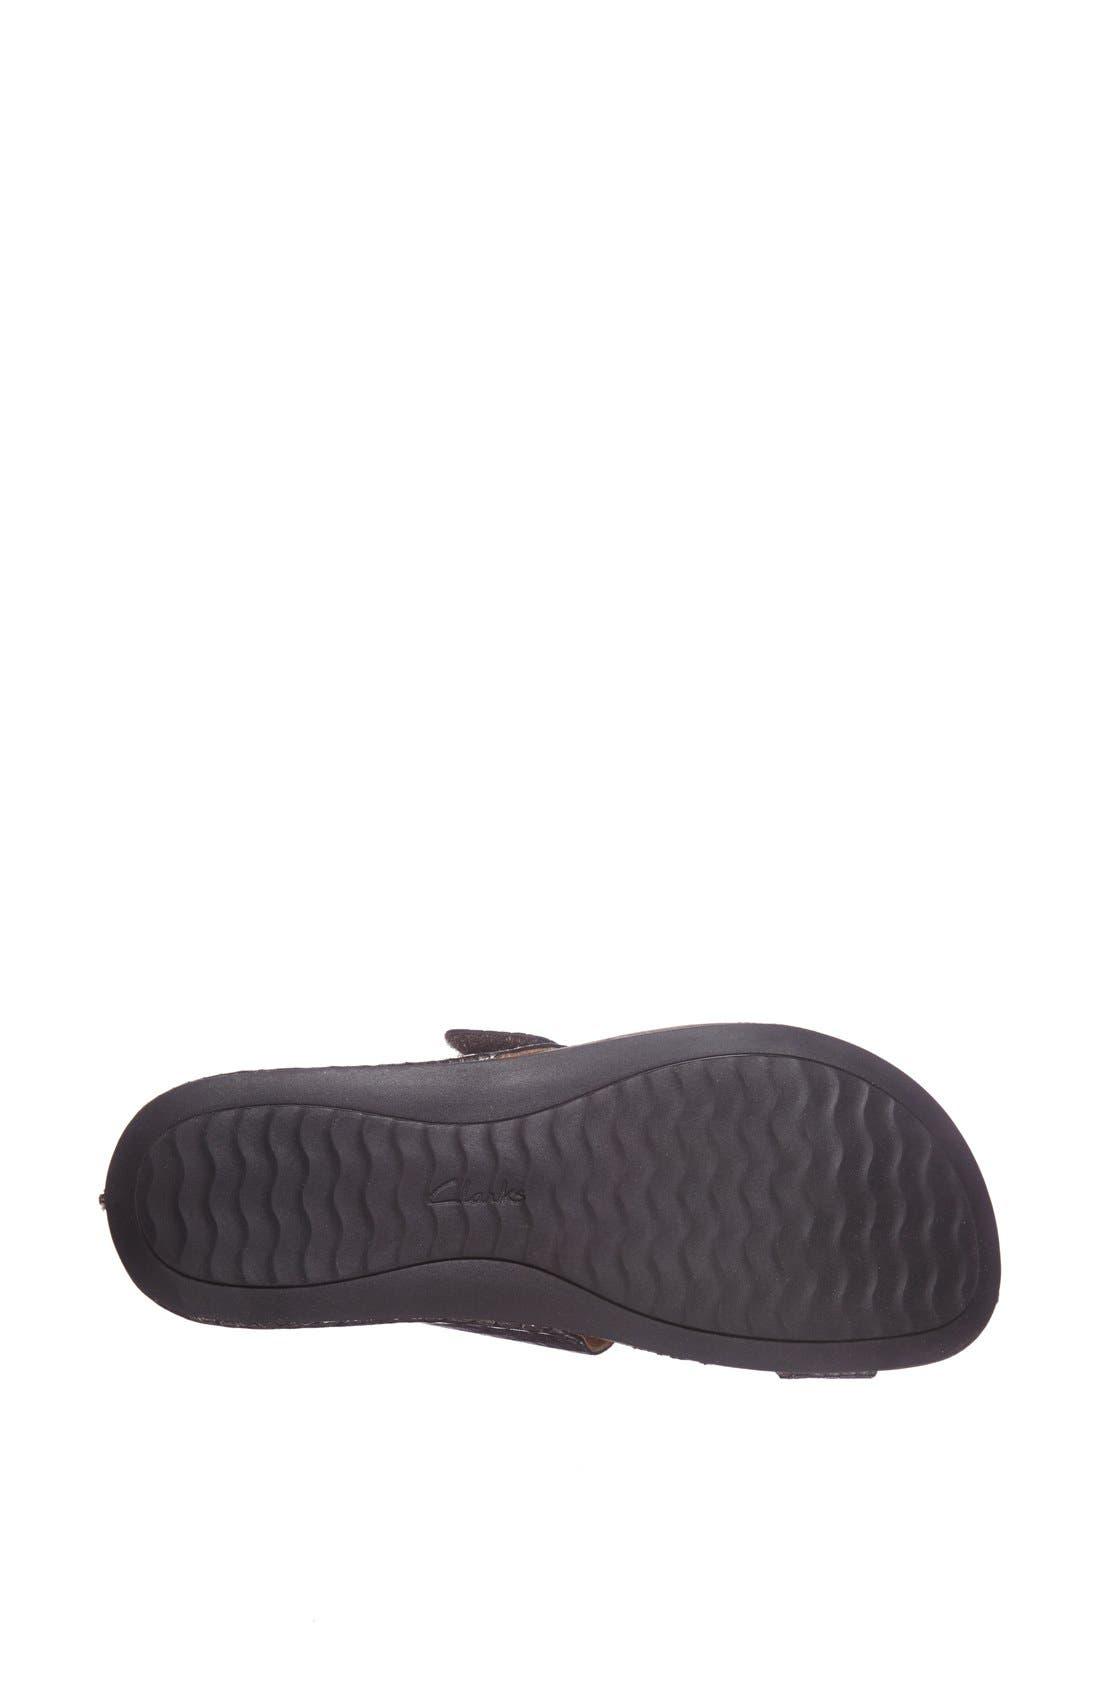 Alternate Image 4  - Clarks® 'Perri Coast' Leather Thong Sandal